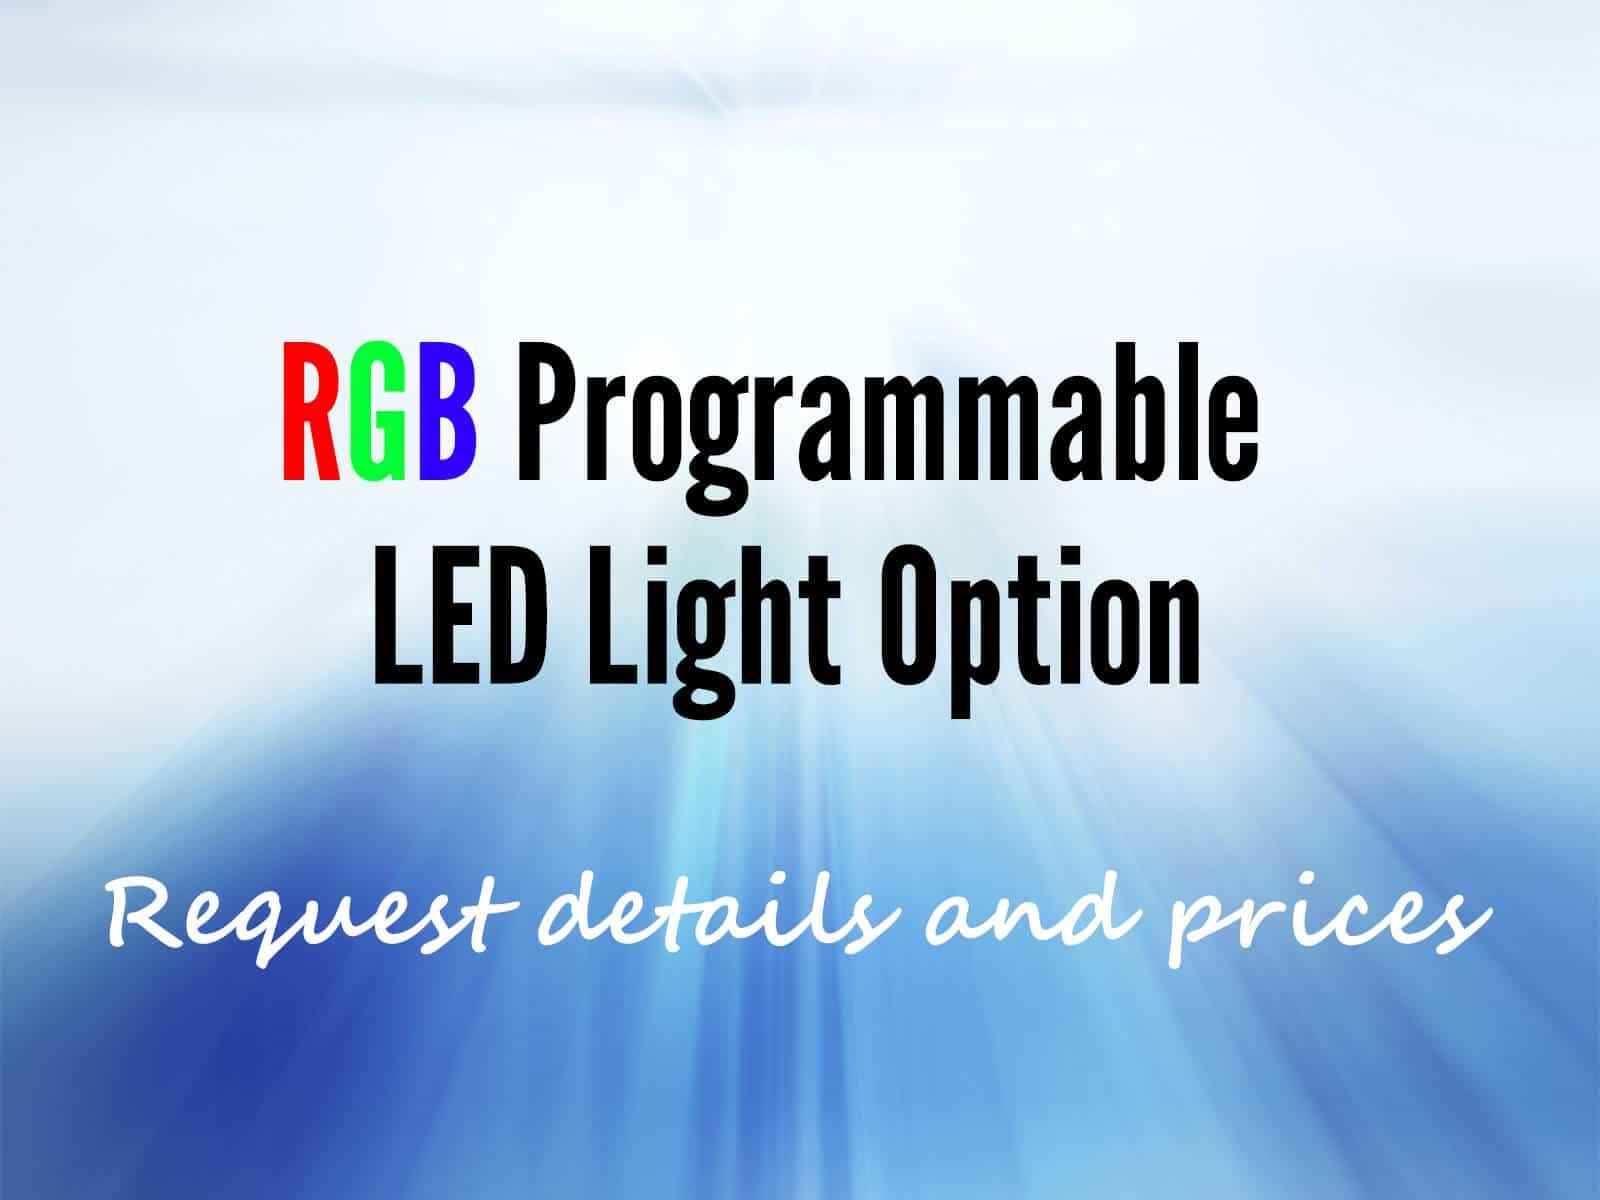 RGB Programmable LED Light Option